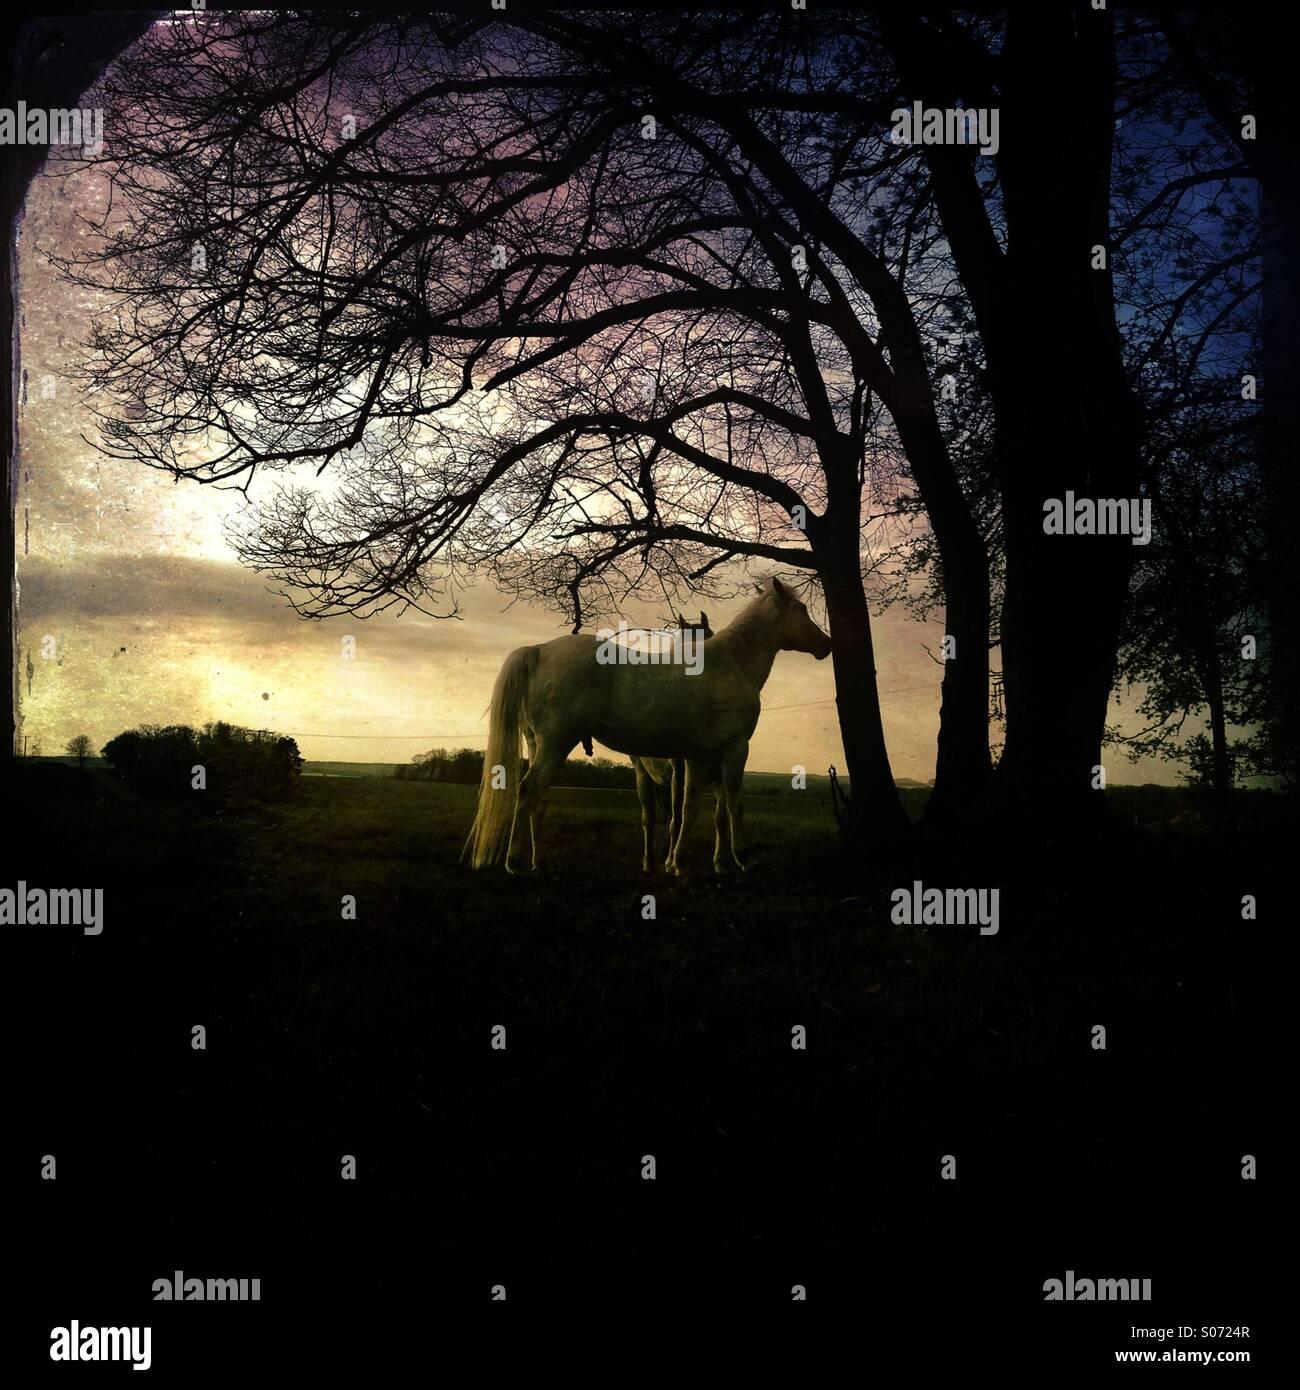 Horses - Stock Image